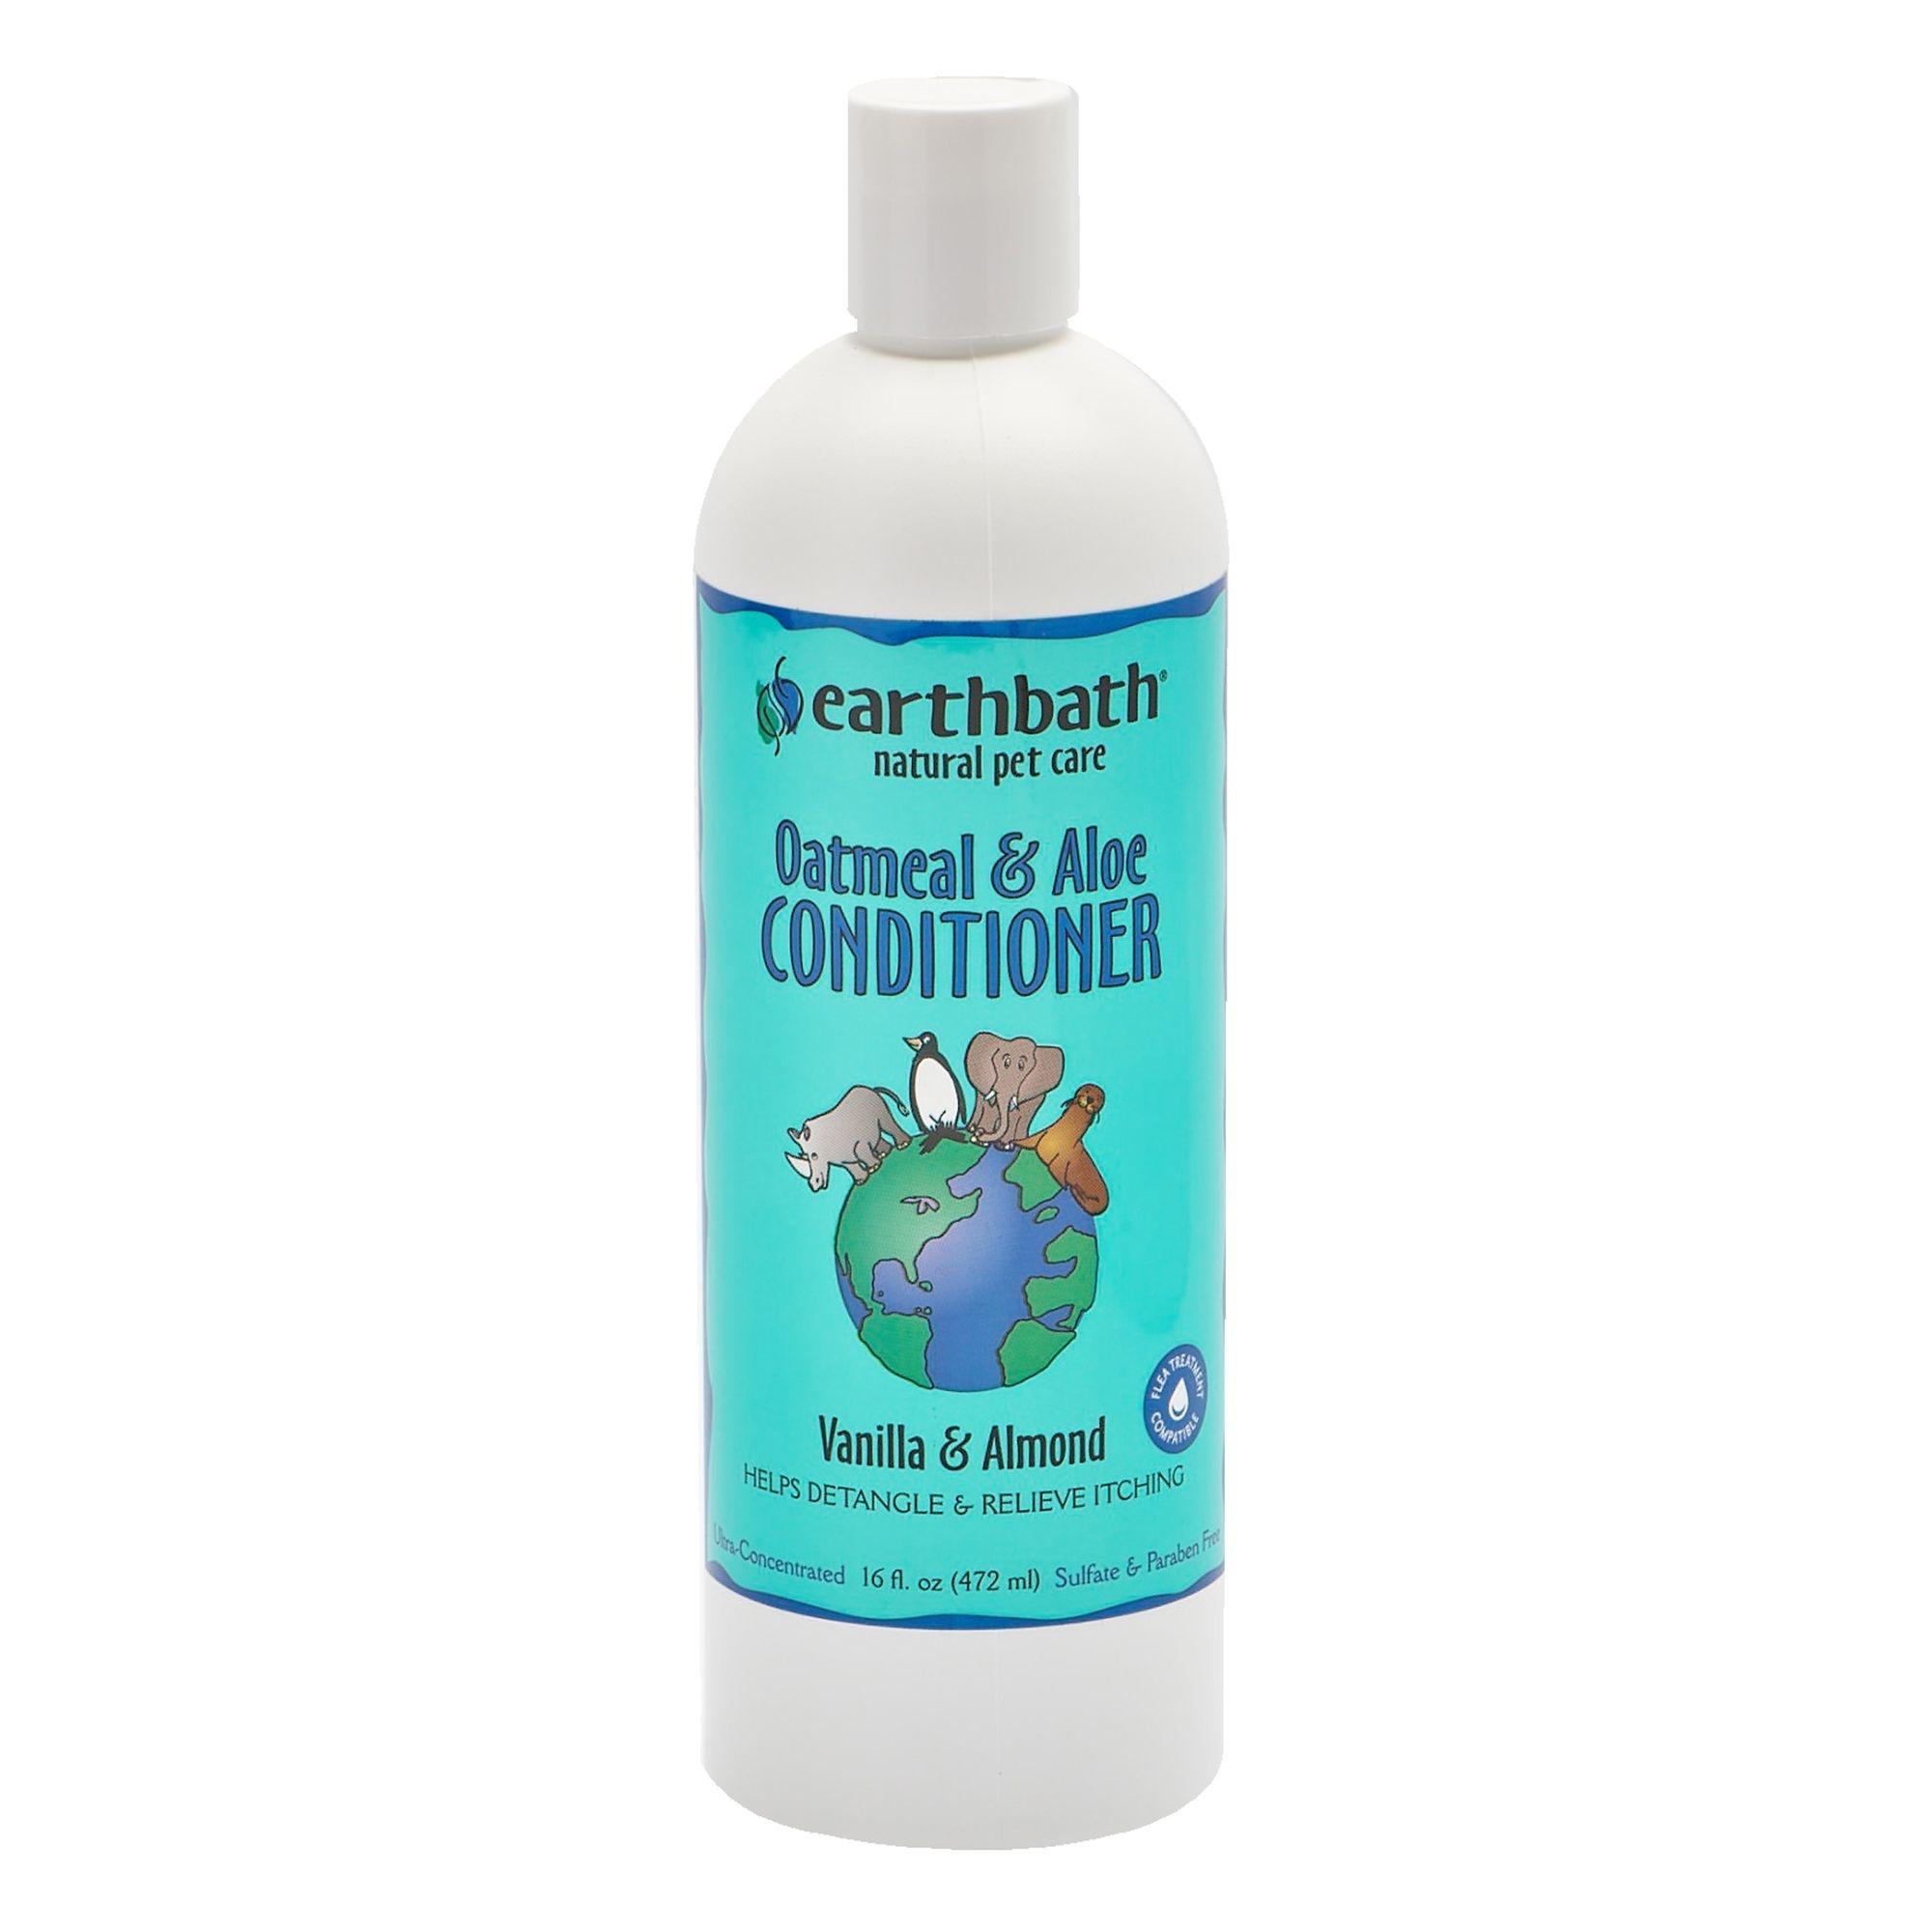 Earthbath Earthbath Oatmeal & Aloe Conditioner Vanilla & Almond Scented 16oz